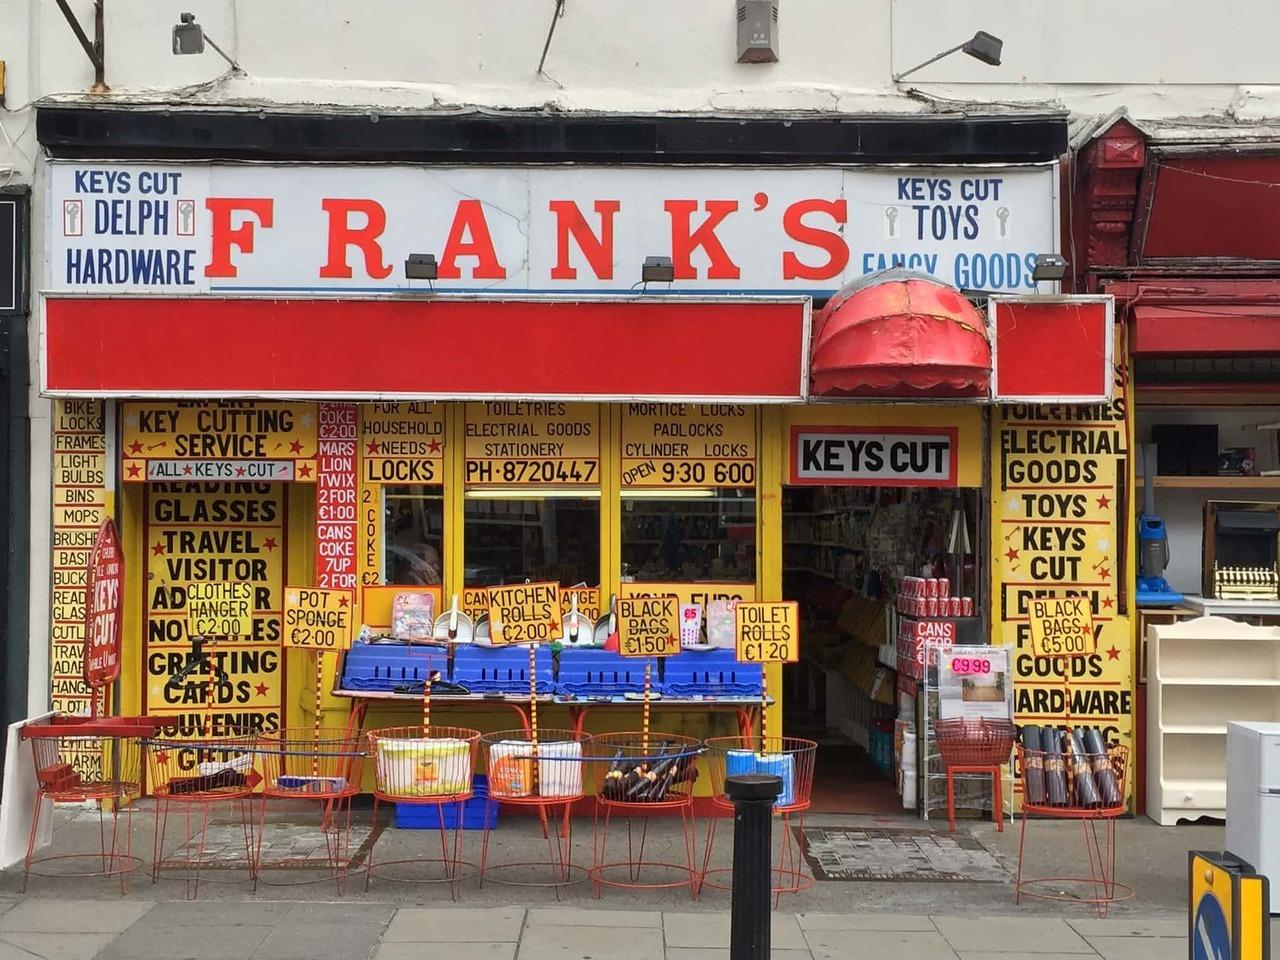 'Frank's Fancy Goods'.